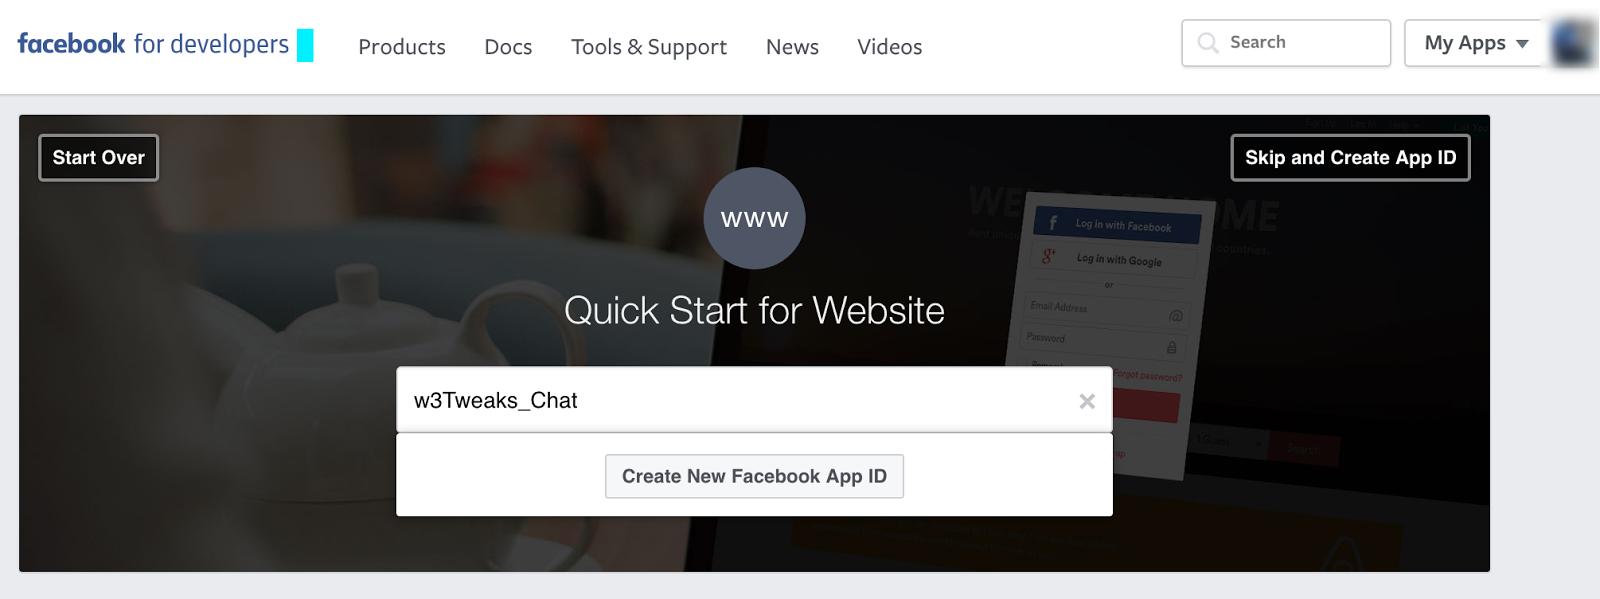 Quick Starts Facebook for Developers